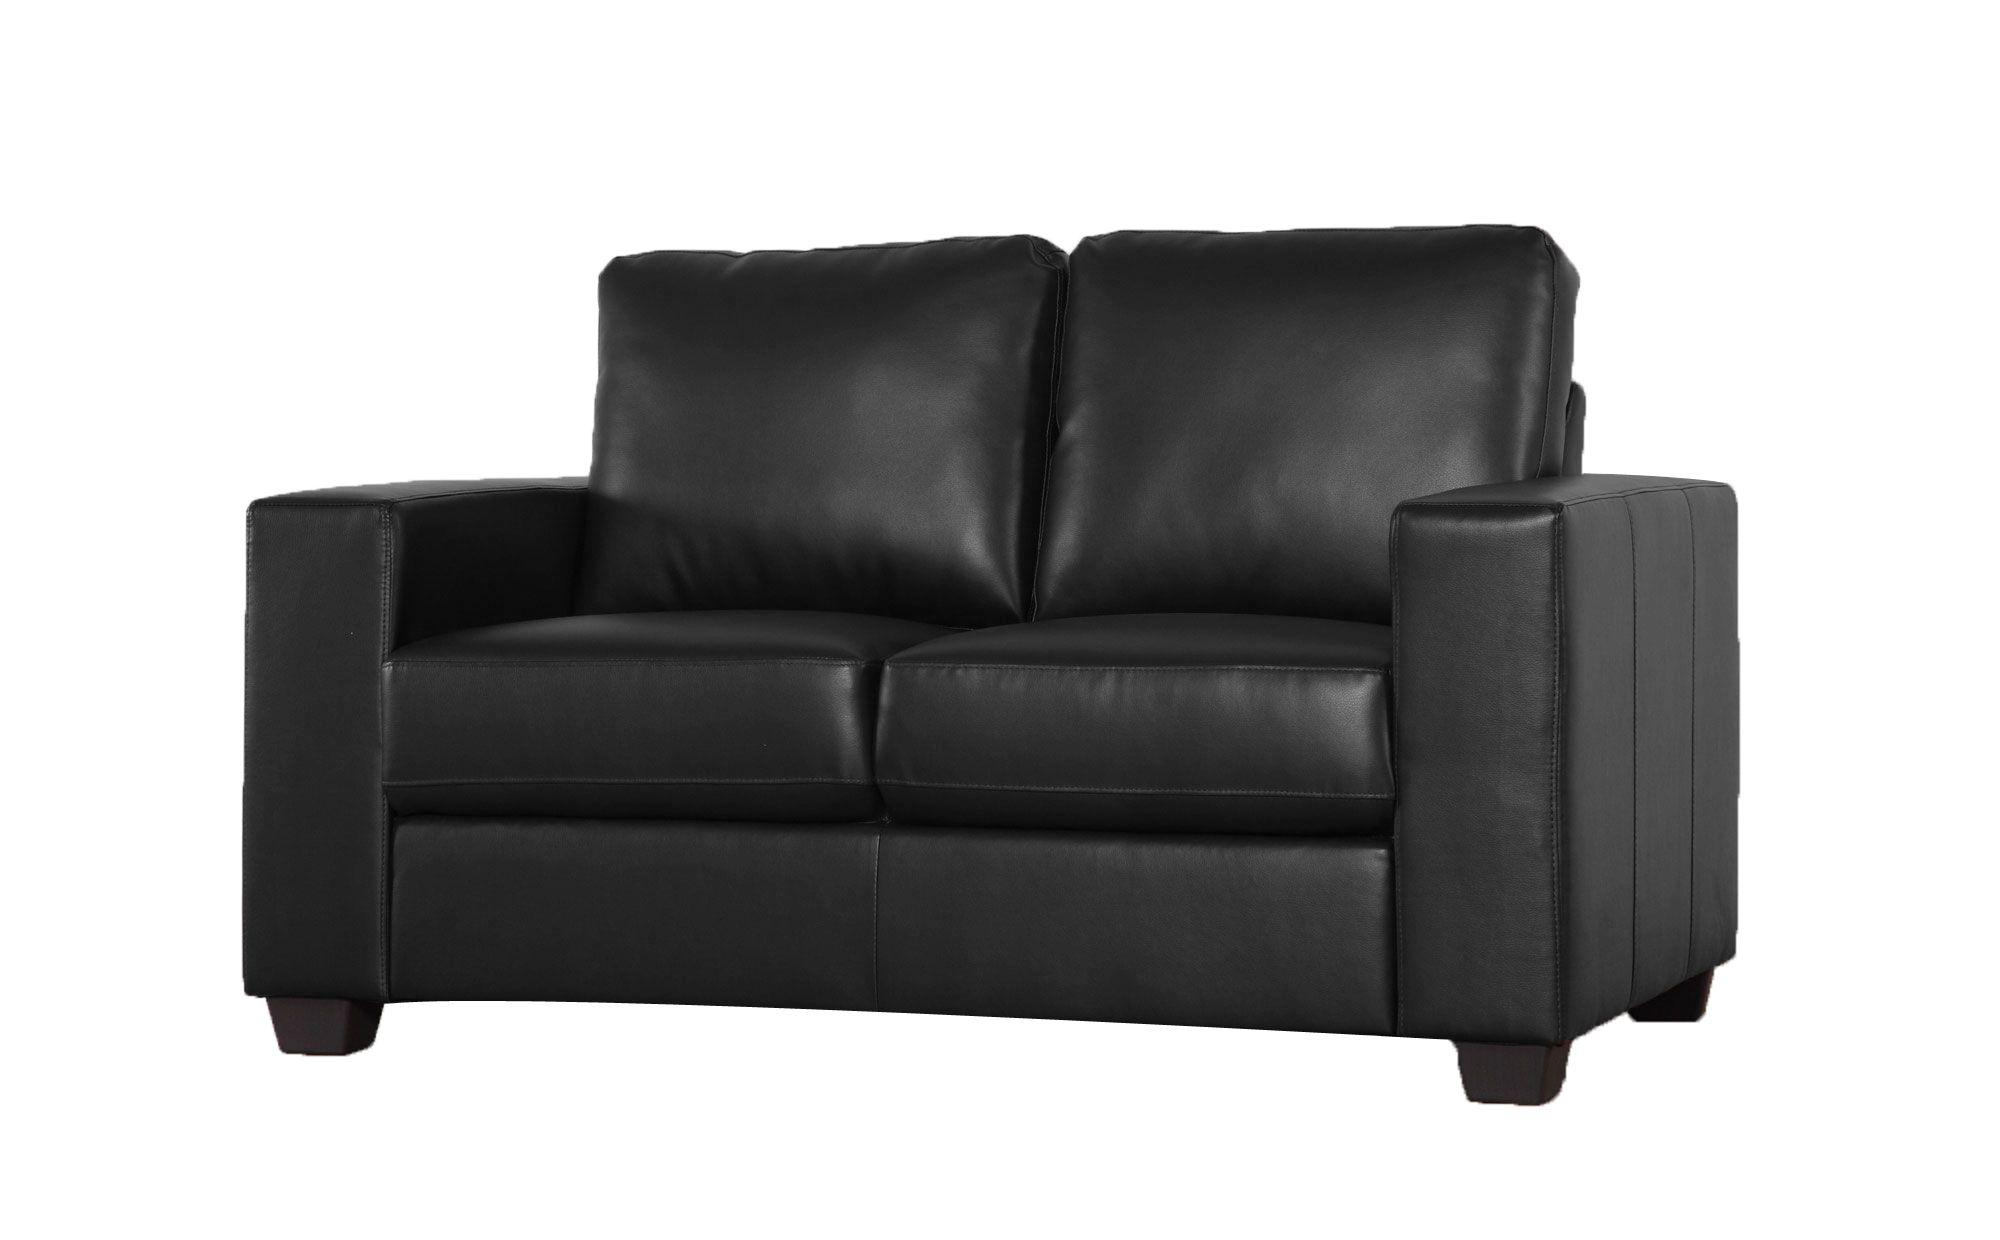 Mission Black 2 Seater Leather Sofa Range 270